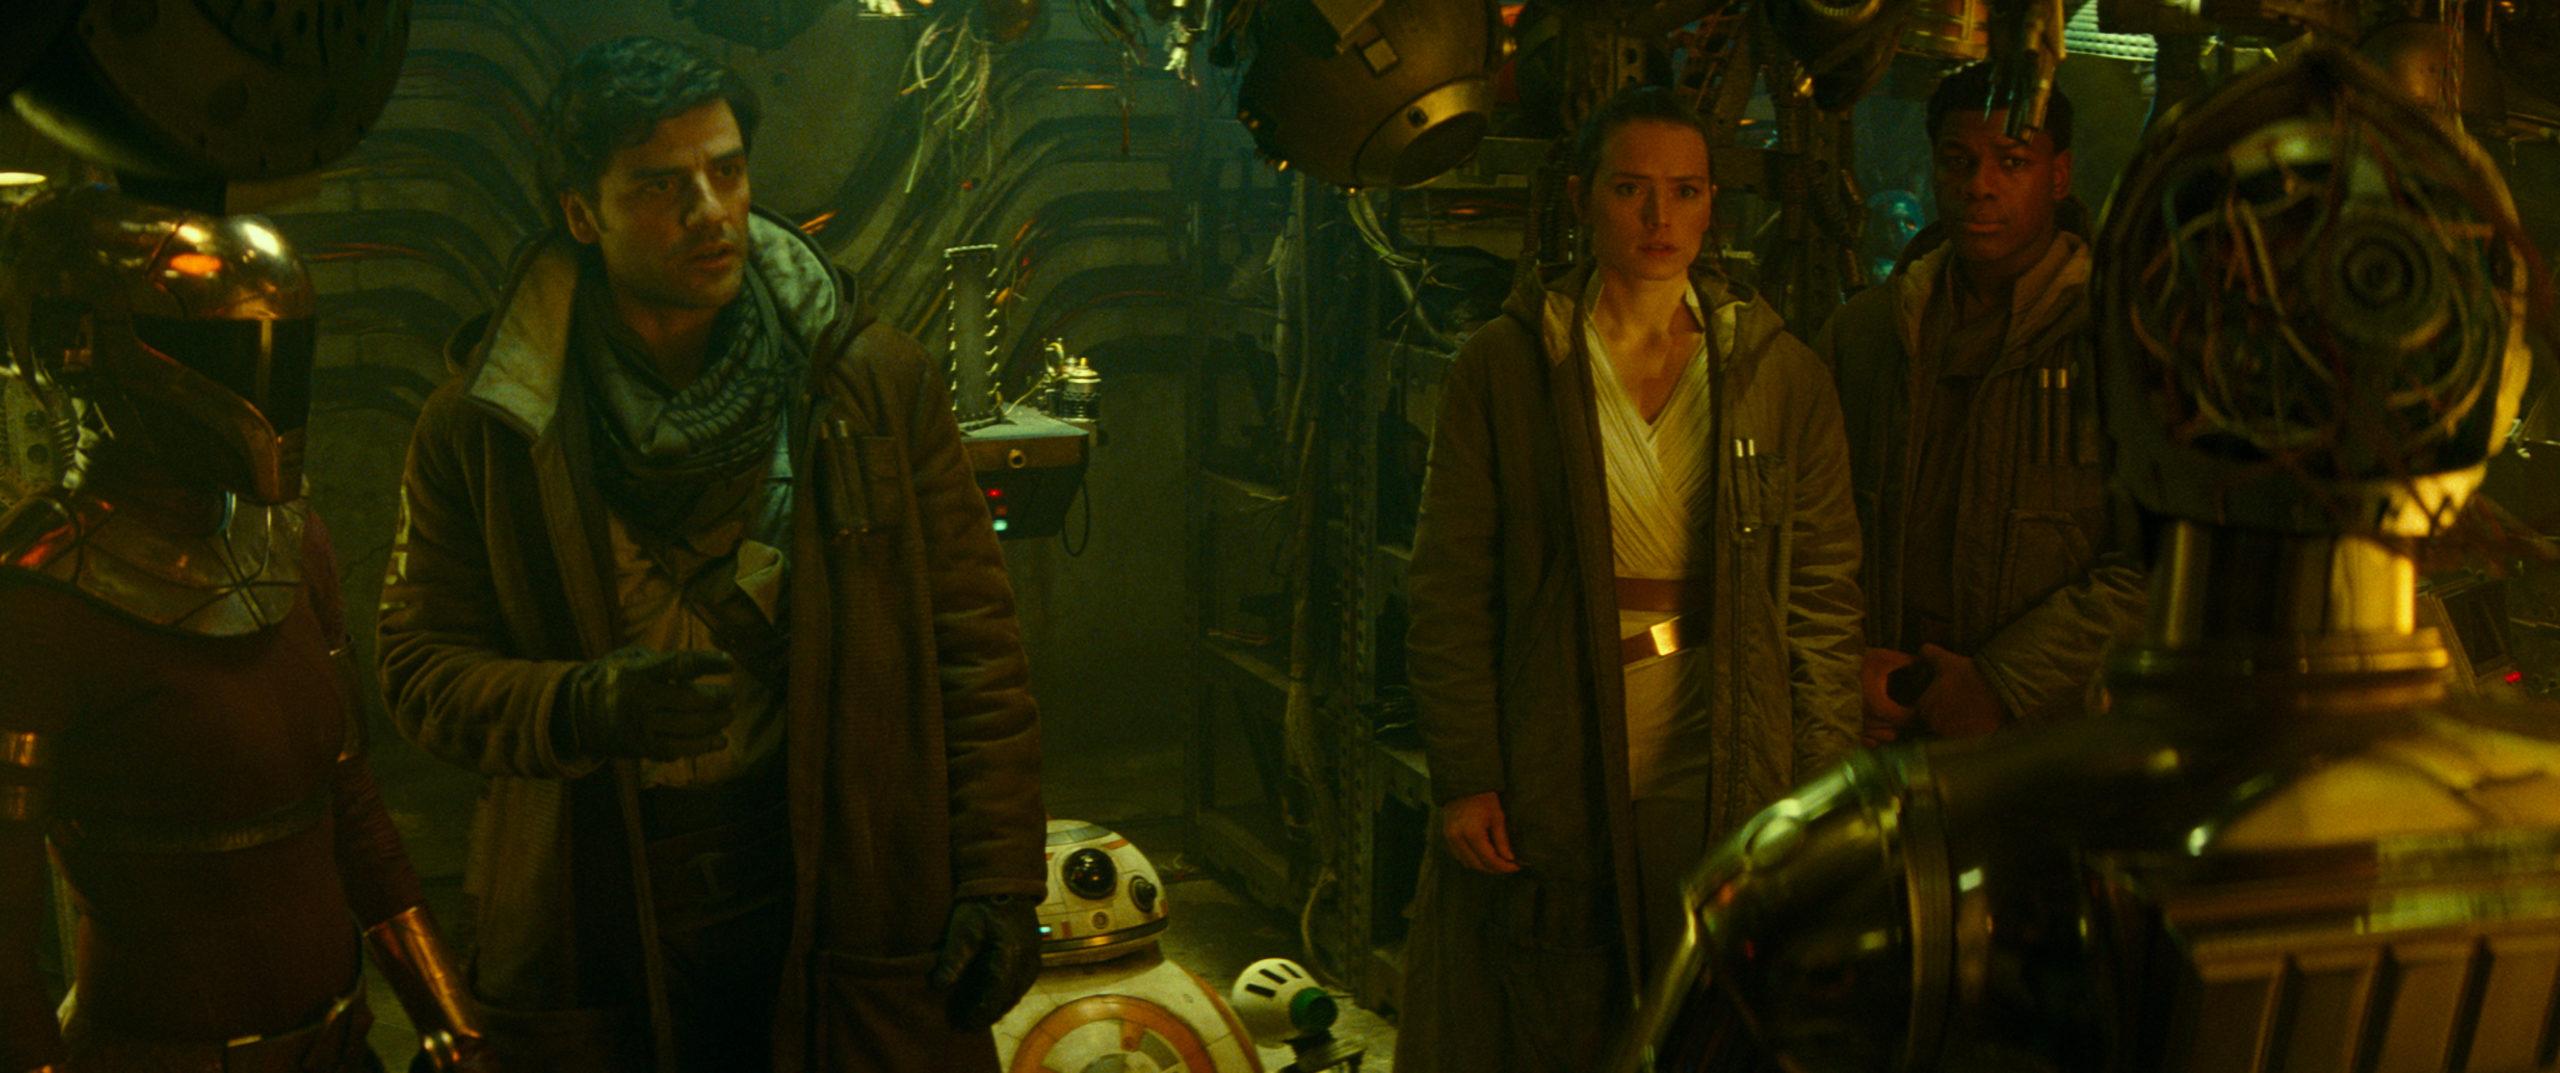 Star Wars: L'Ascesa di Skywalker, su Disney+ dal 4 maggio